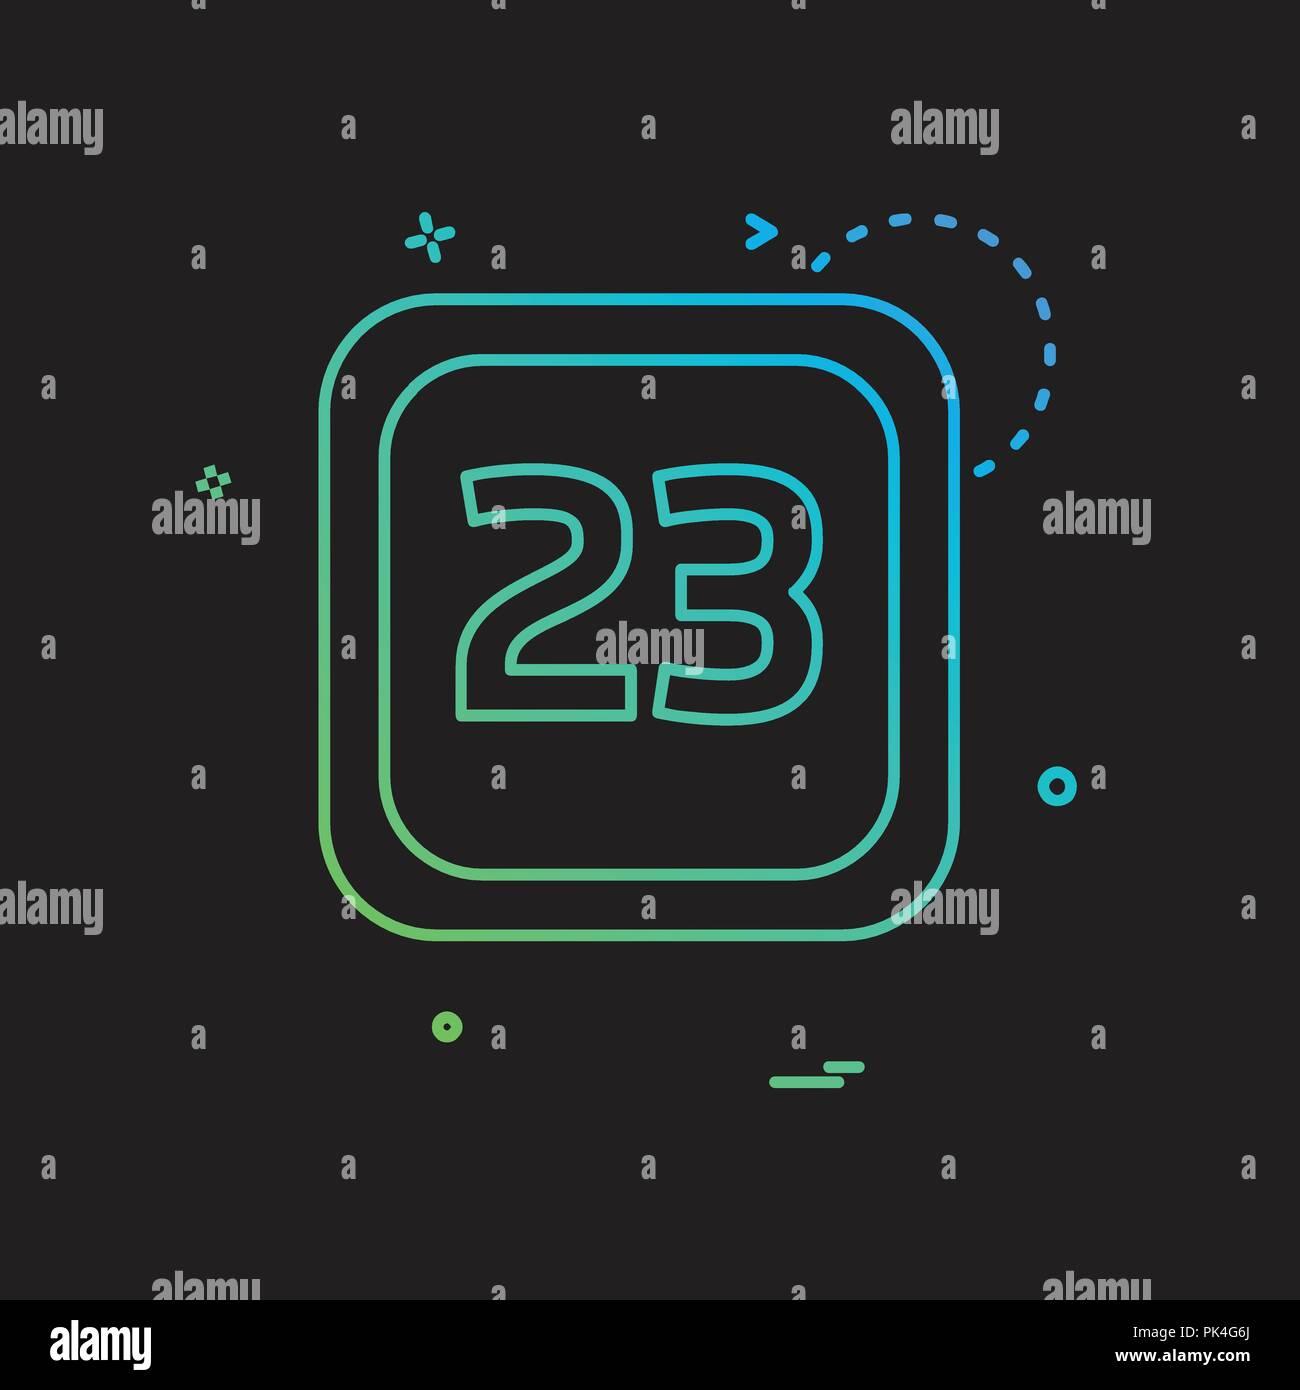 23 Date Calender icon design vector - Stock Vector